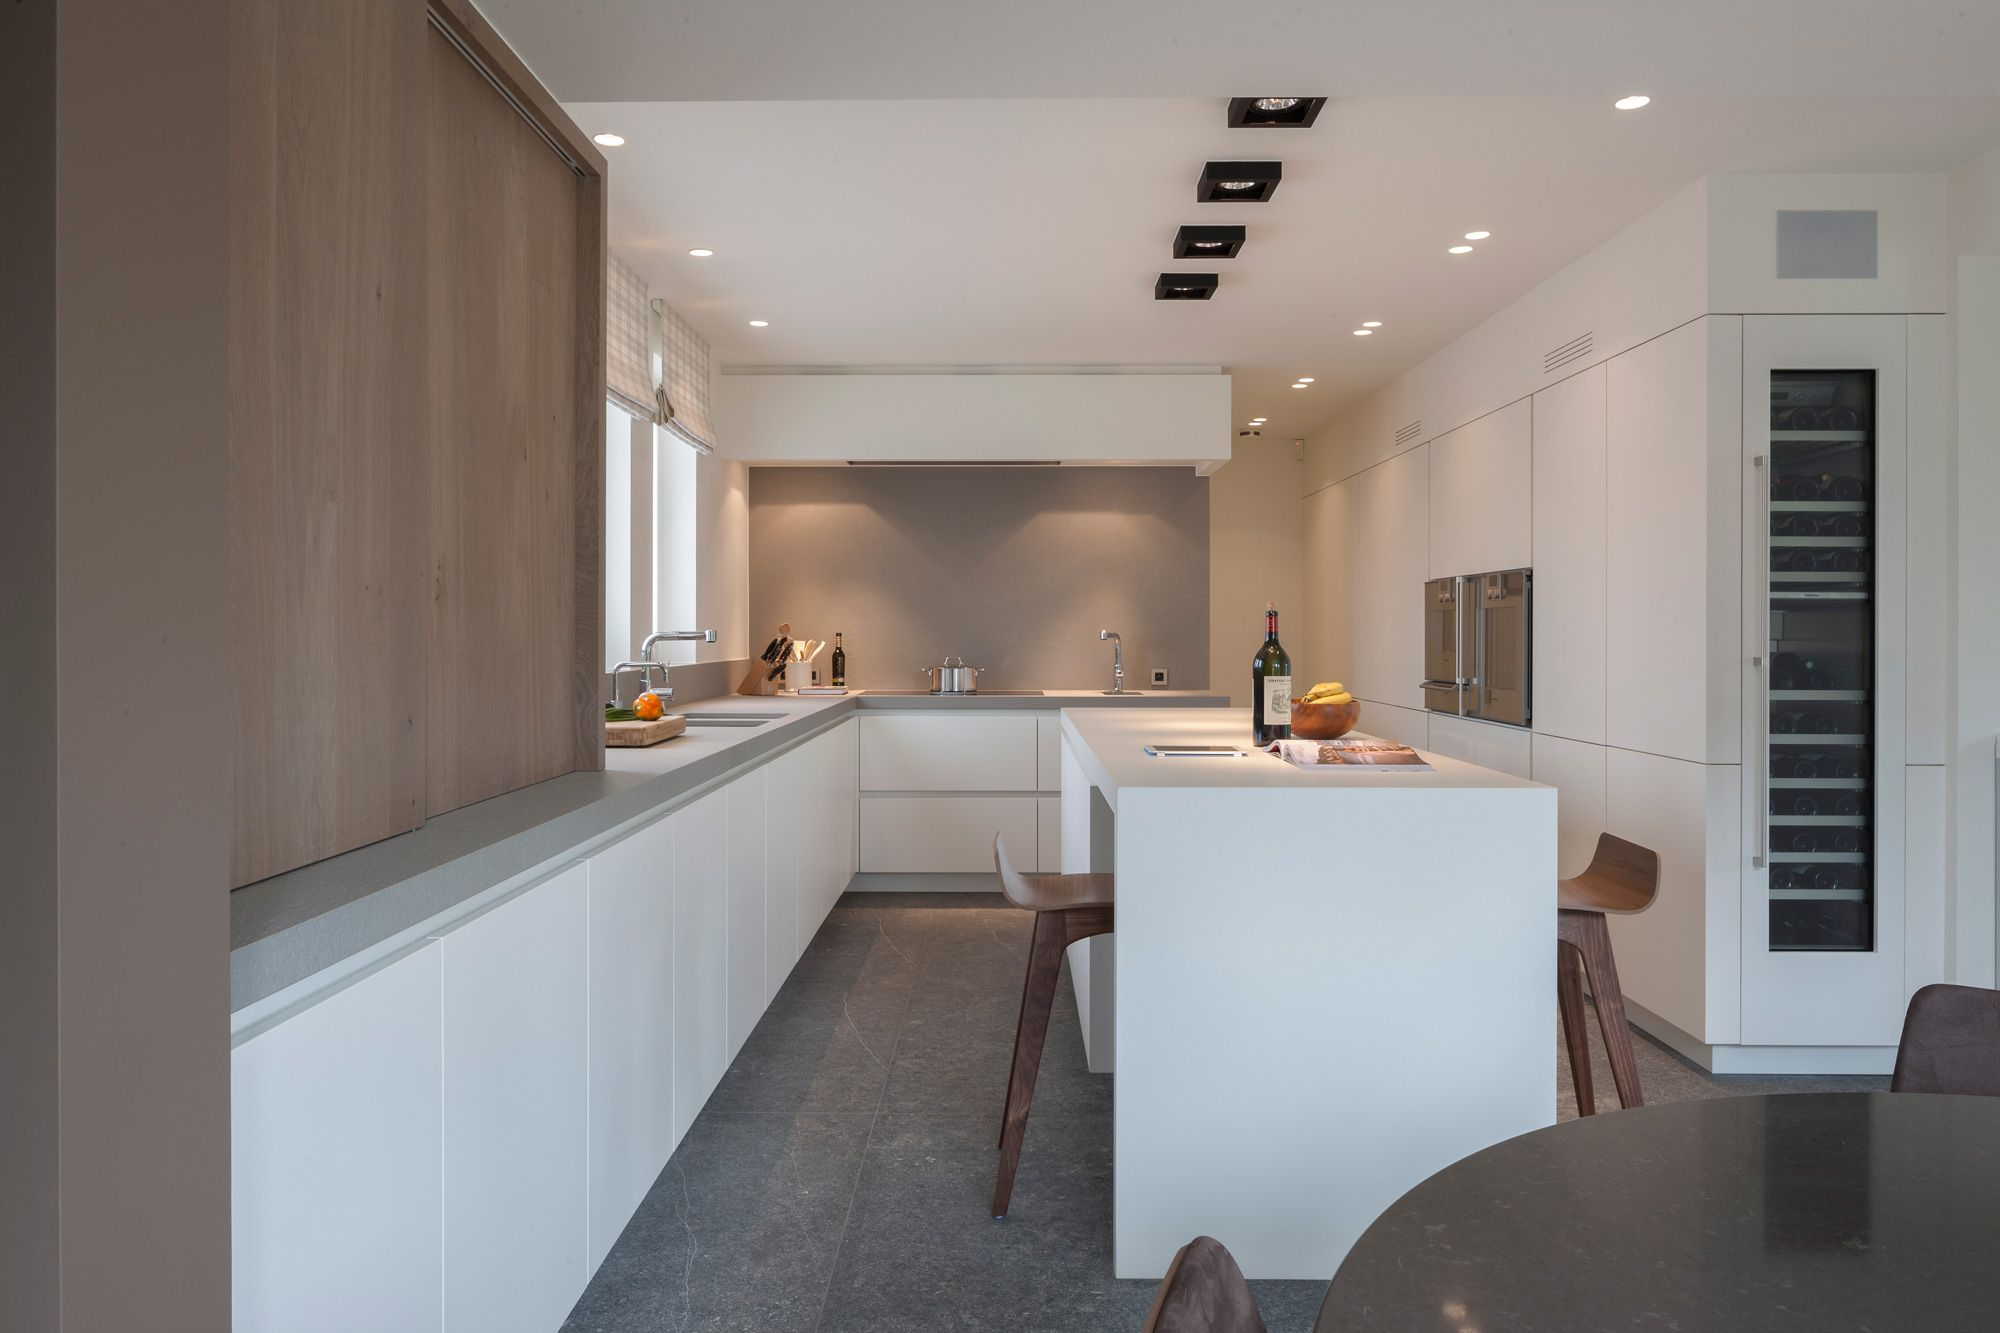 Louis culot keukenwerkbladen in natuursteen dom i wnętrza